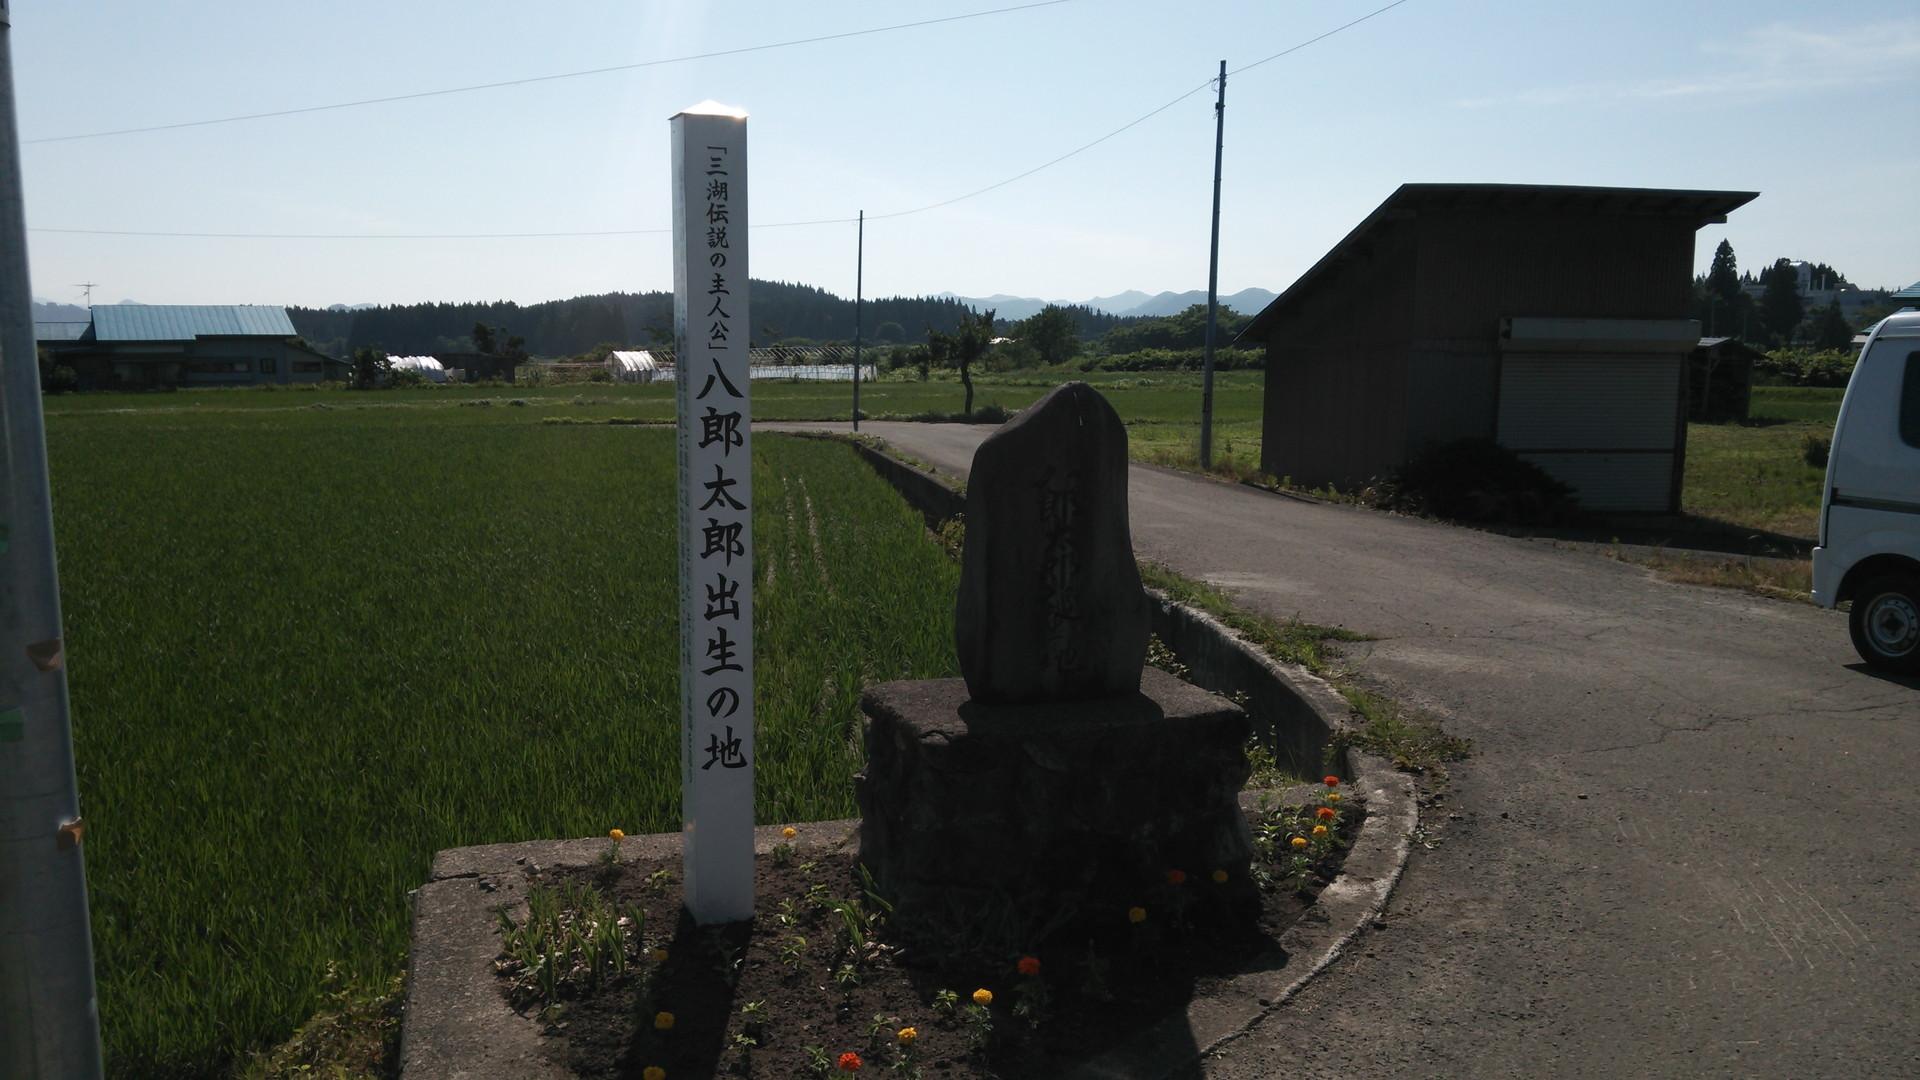 hachikusaki006.jpg